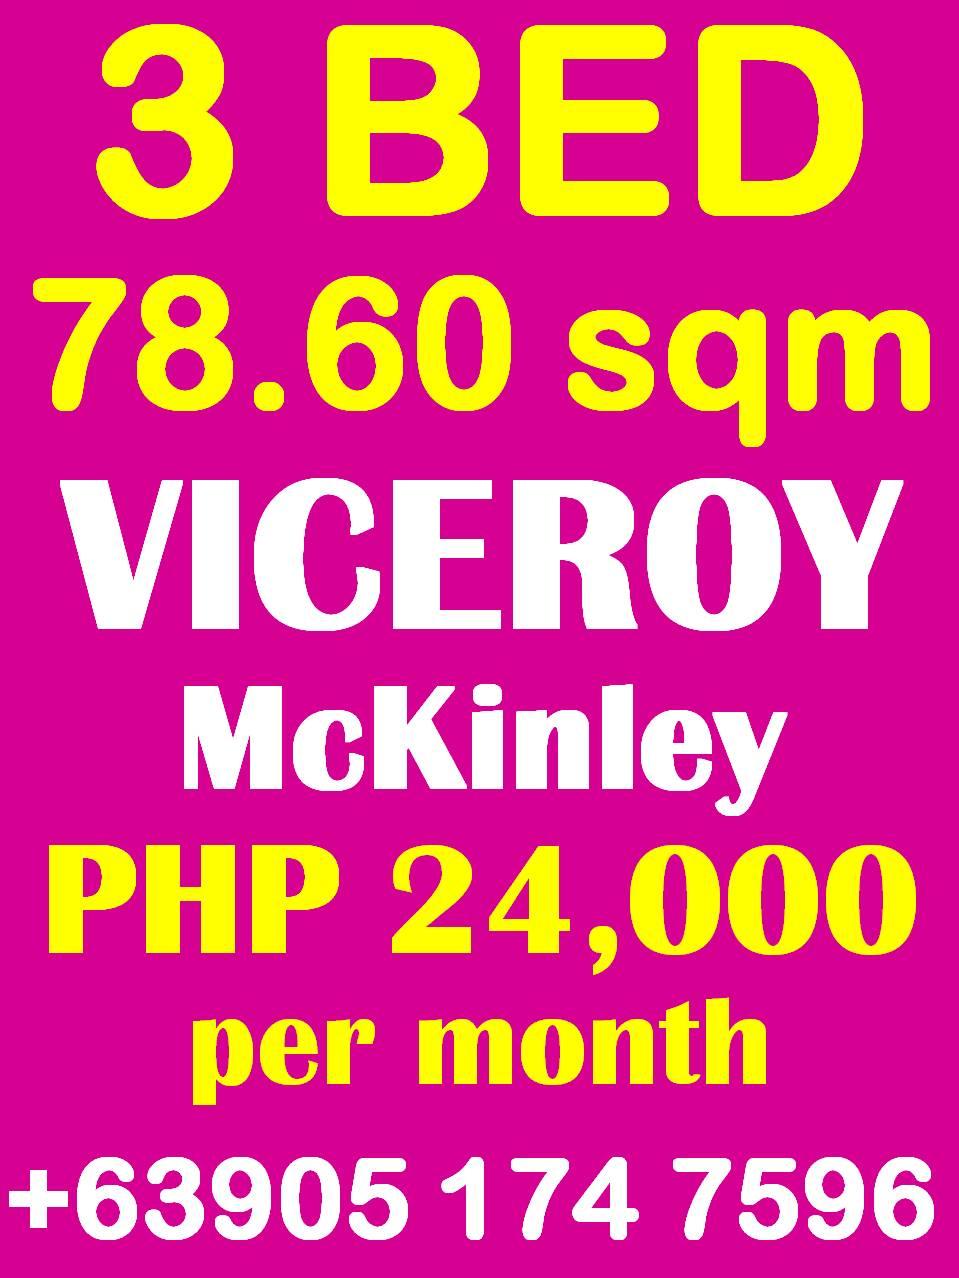 Viceroy McKinley Hill - 3 Bedroom